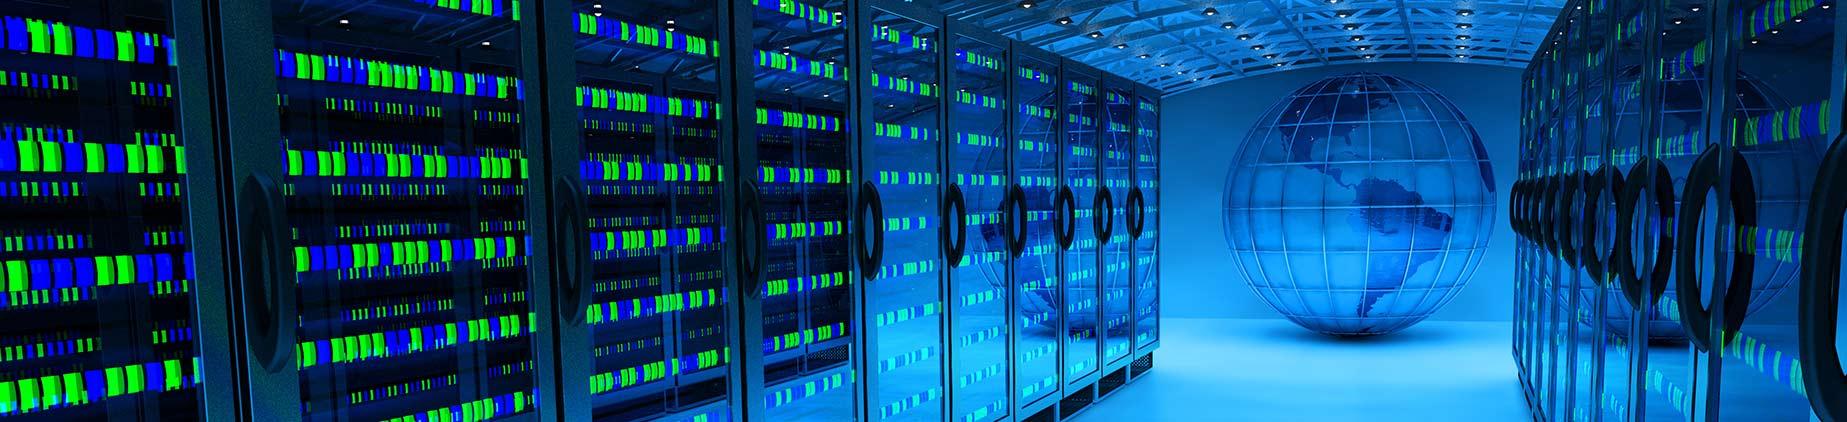 cabecera-servidores